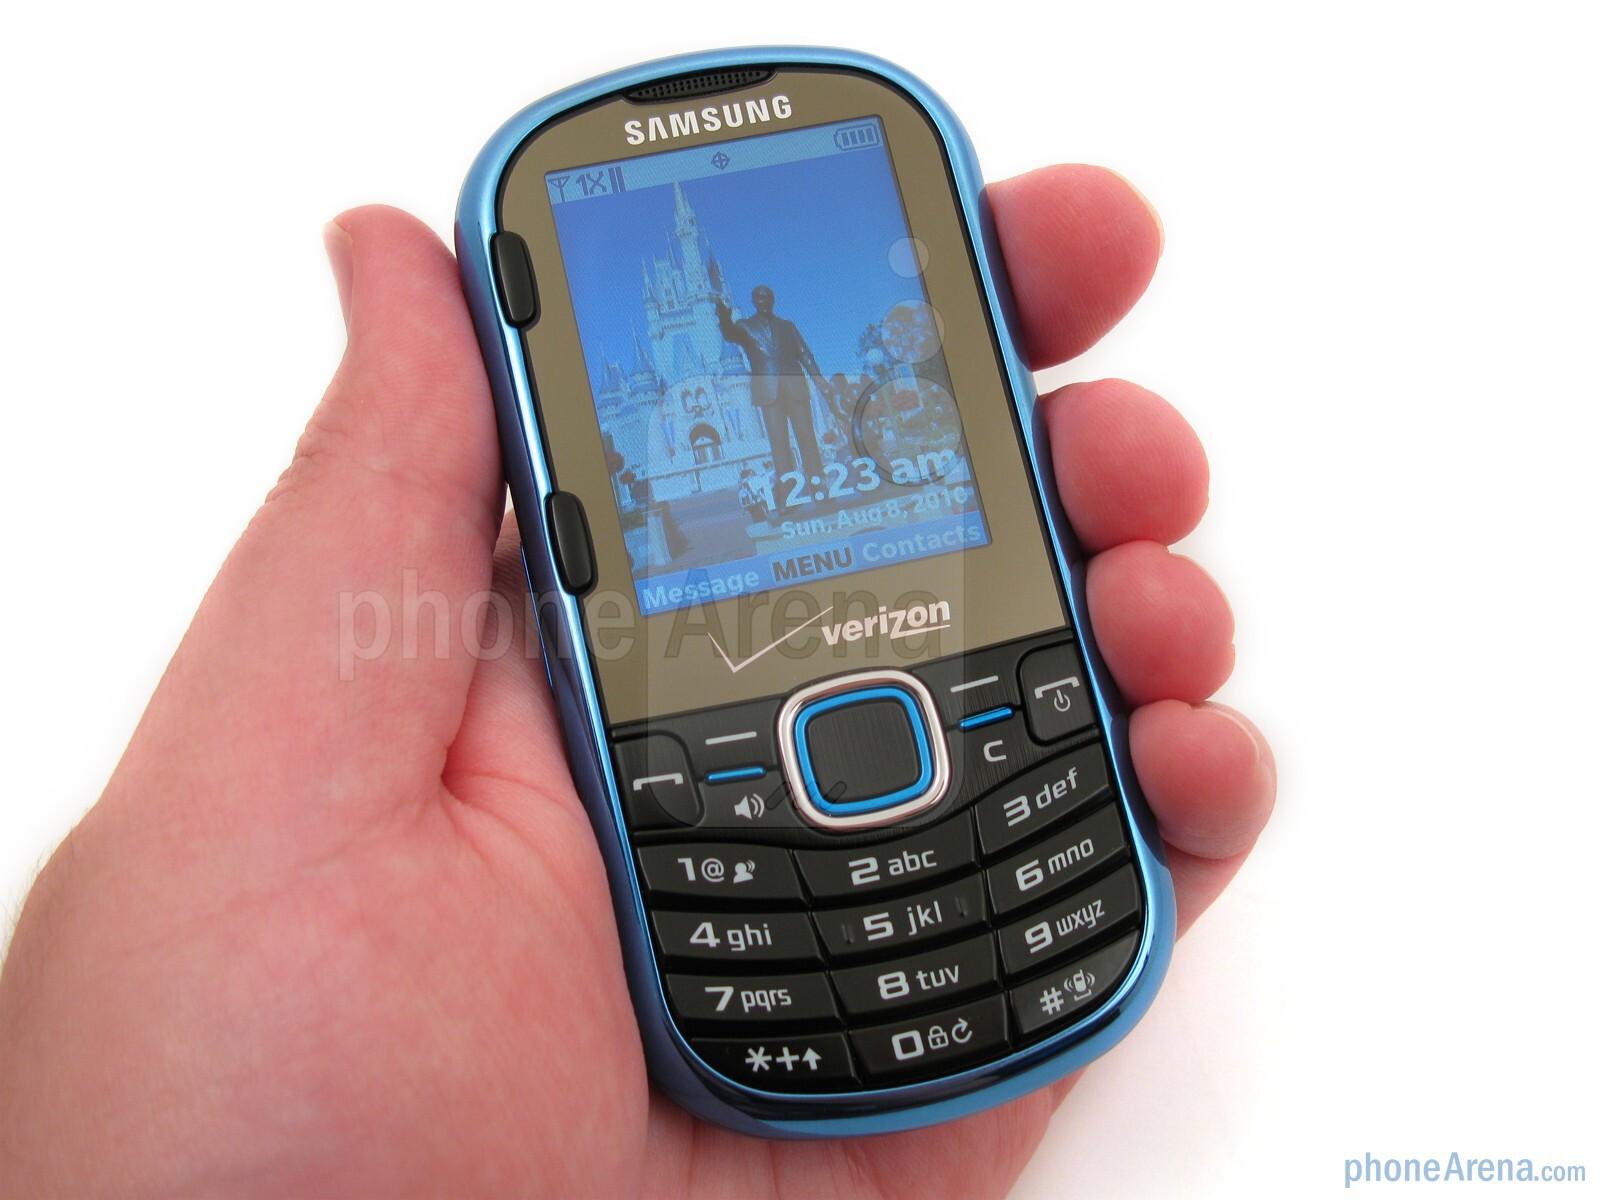 samsung intensity ii review rh phonearena com Samsung Model Sch U460 Manual Verizon Samsung Sch U460 Manual